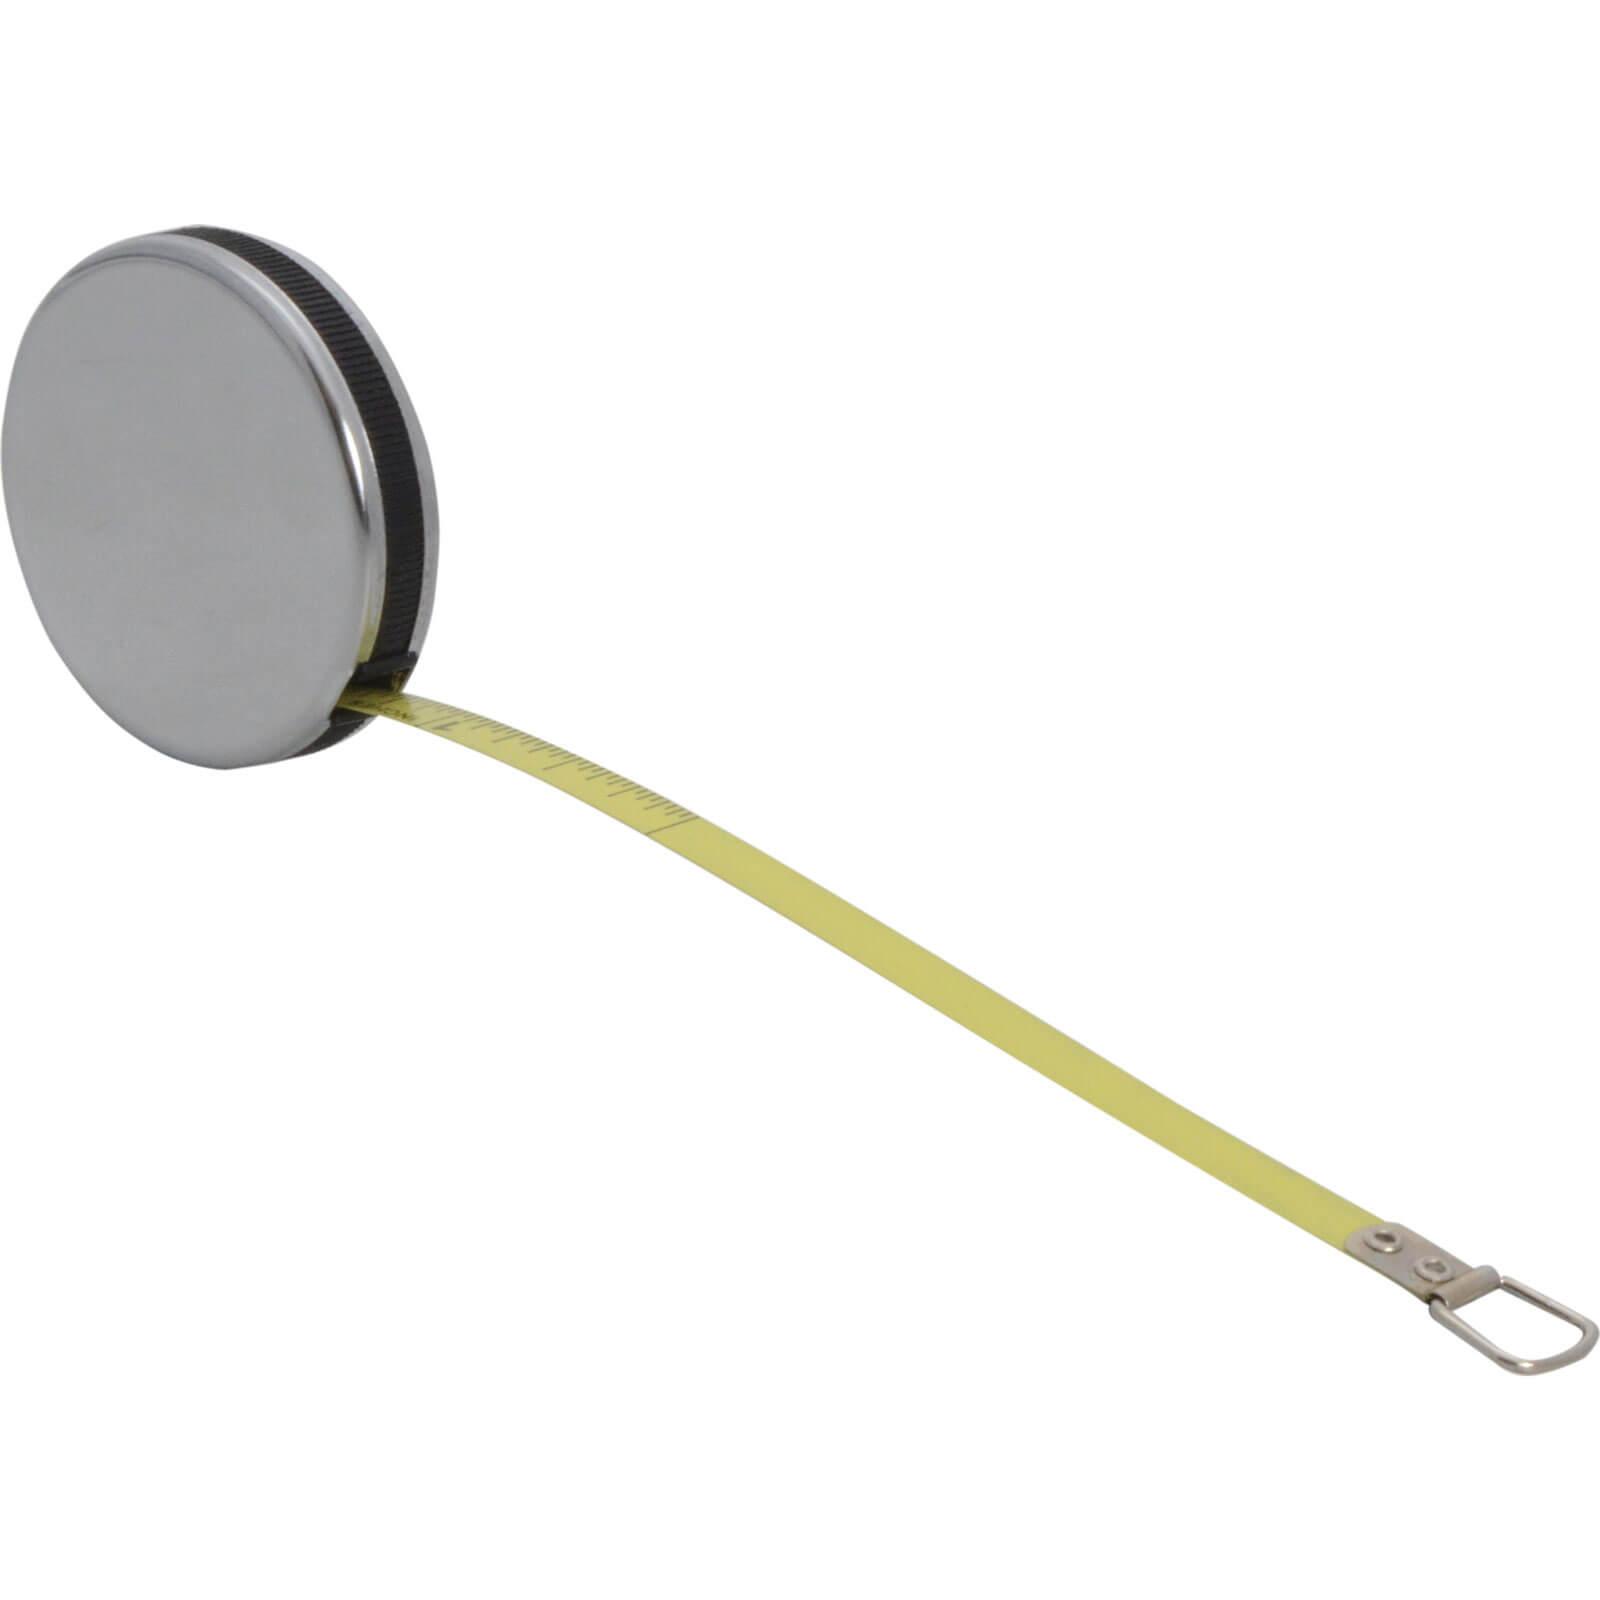 "Image of Lufkin Diameter Tape Measure Imperial & Metric 72"" / 2m 6mm"